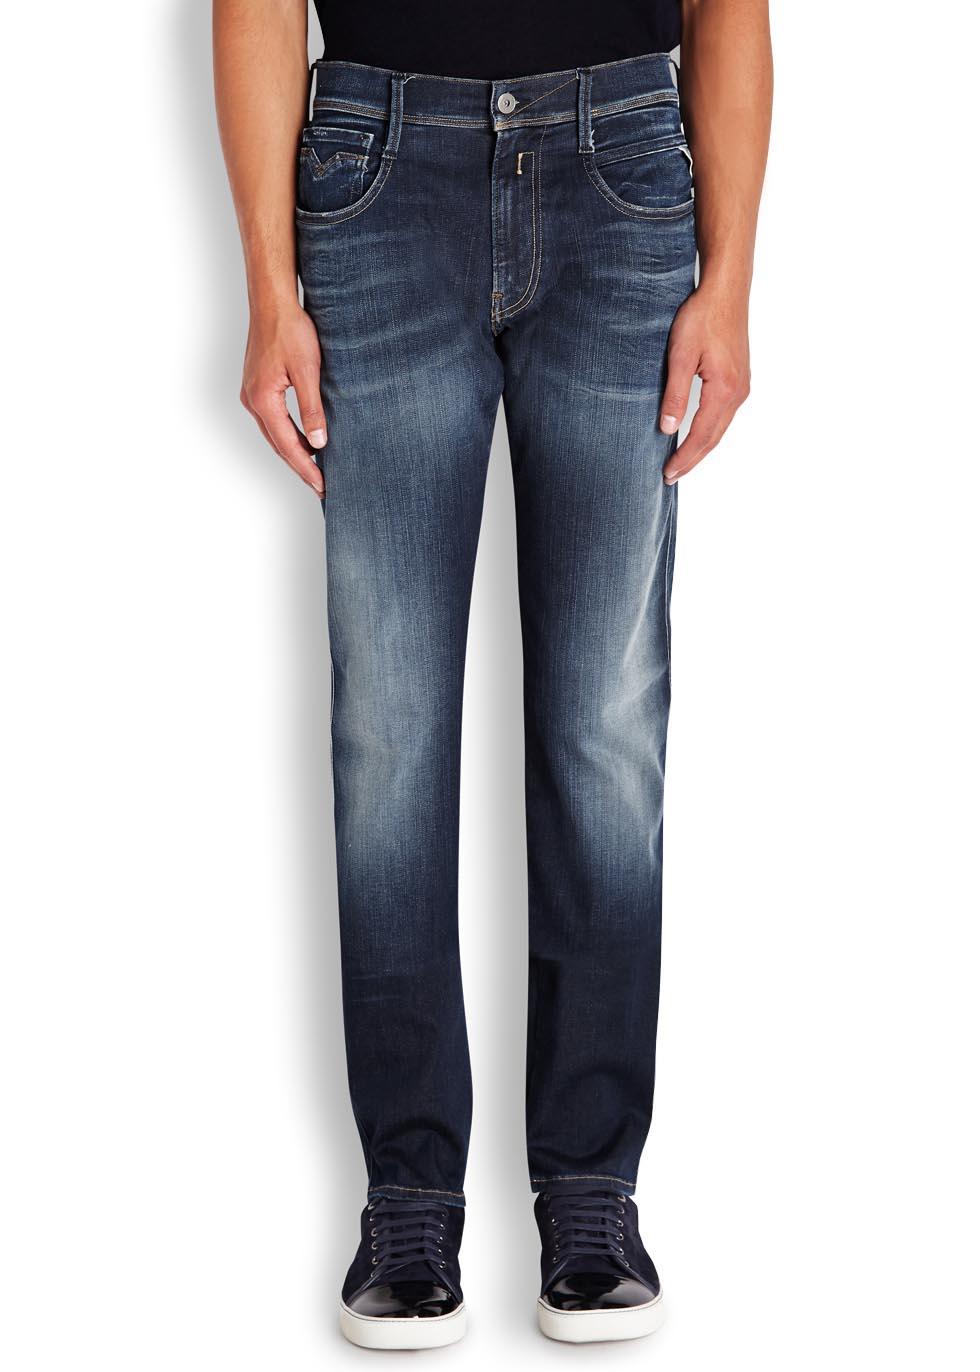 Anbass Hyperflex blue slim-leg jeans - Replay